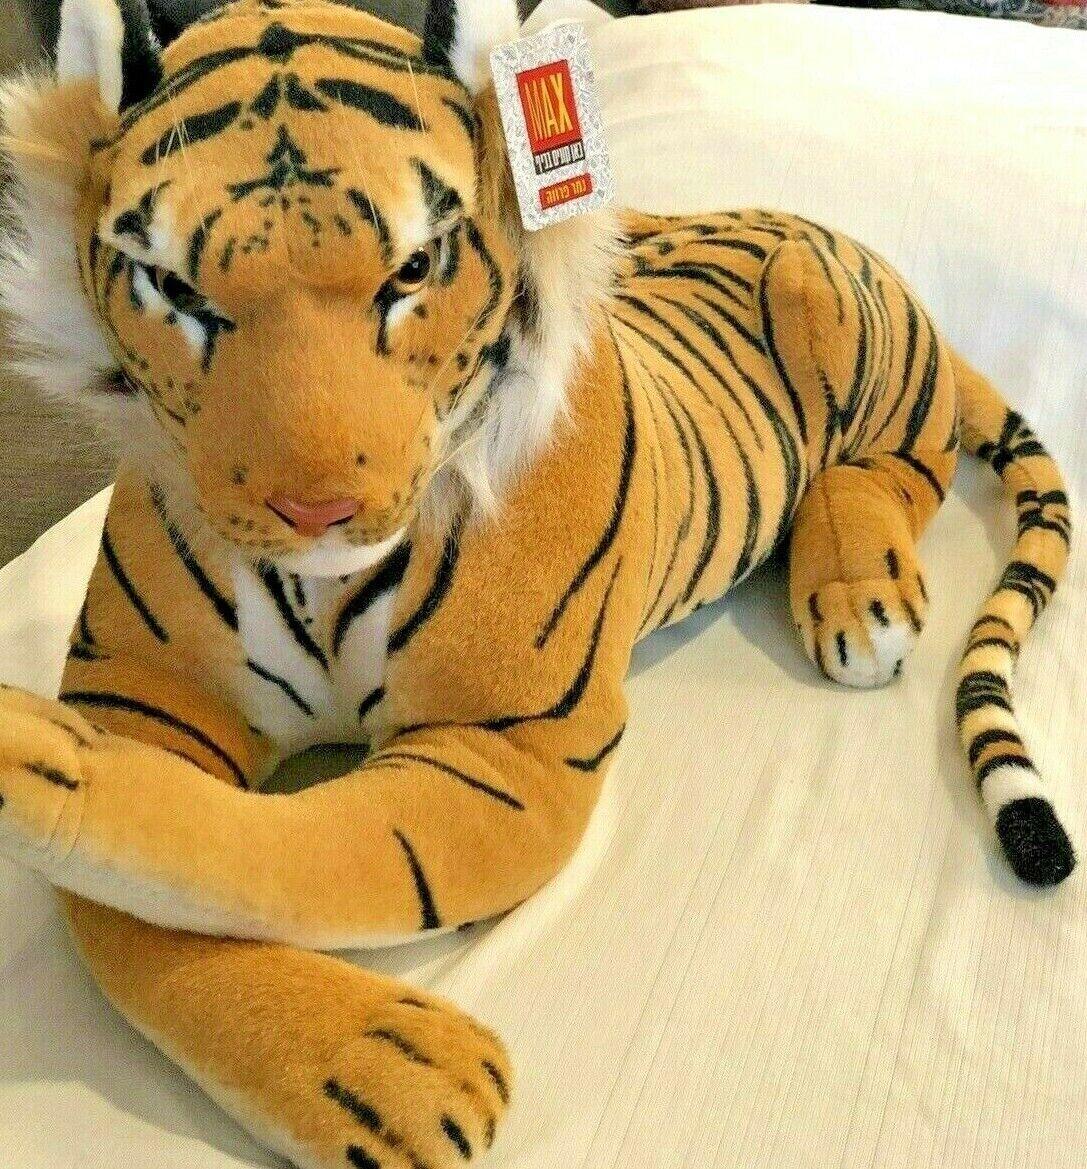 Large TIGER Plush Toy Stuffed Animal Doll Pillow LIFE LIKE  NWT GLOBAL